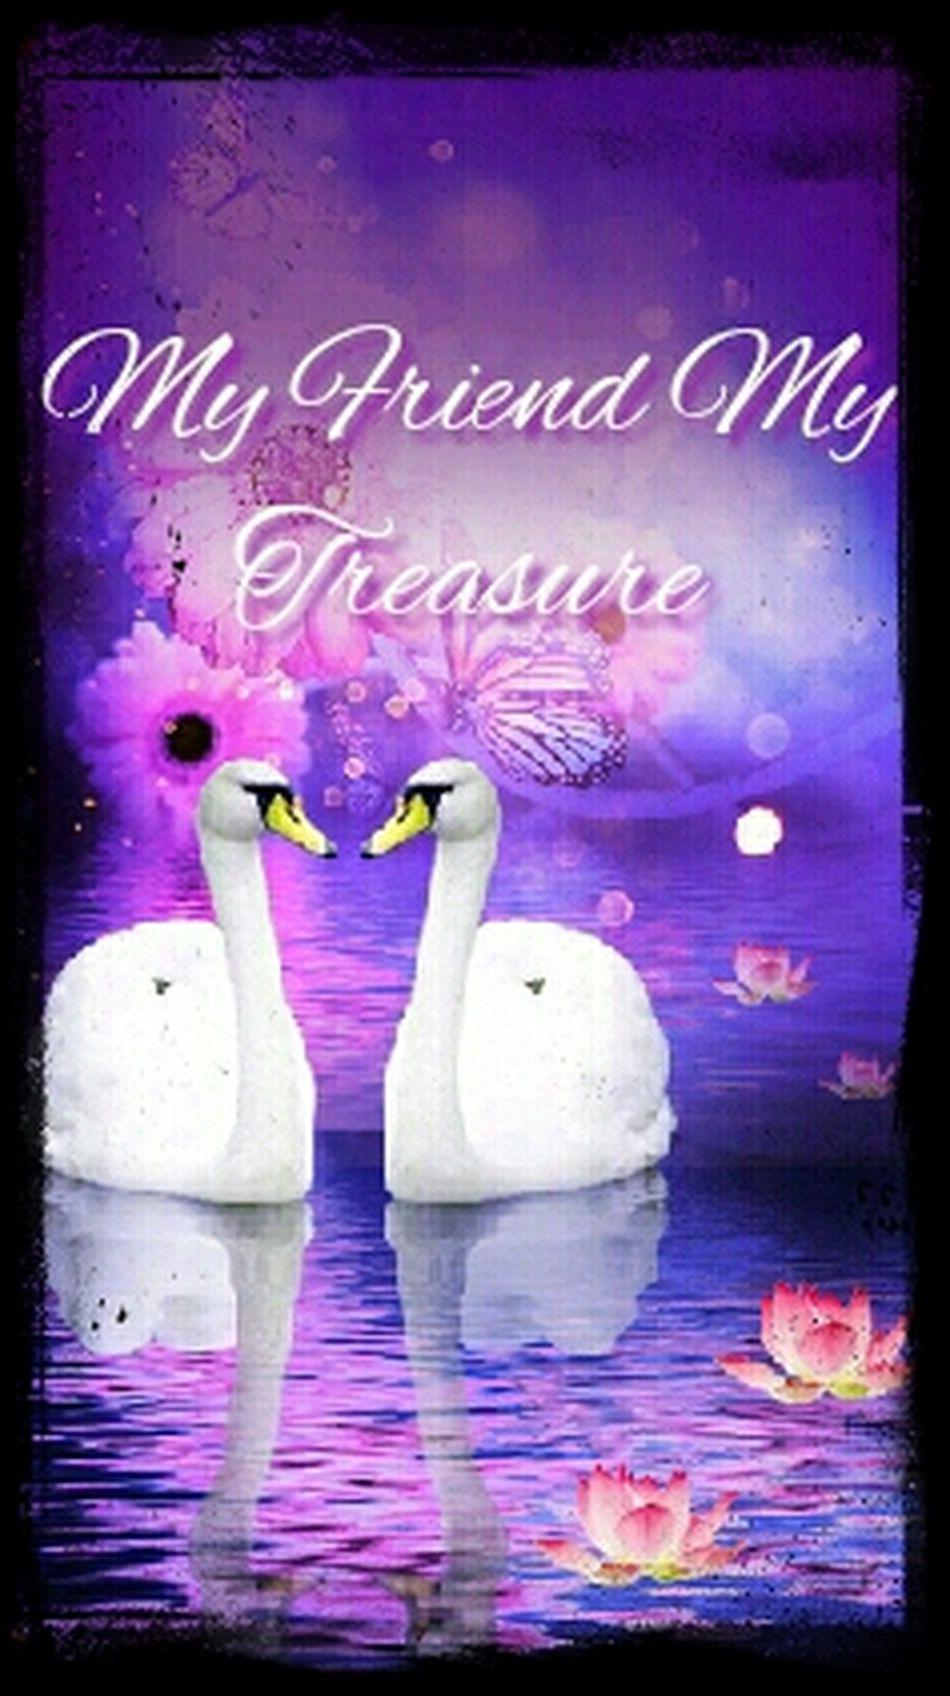 9588467friends are treasures 337861 619 337861